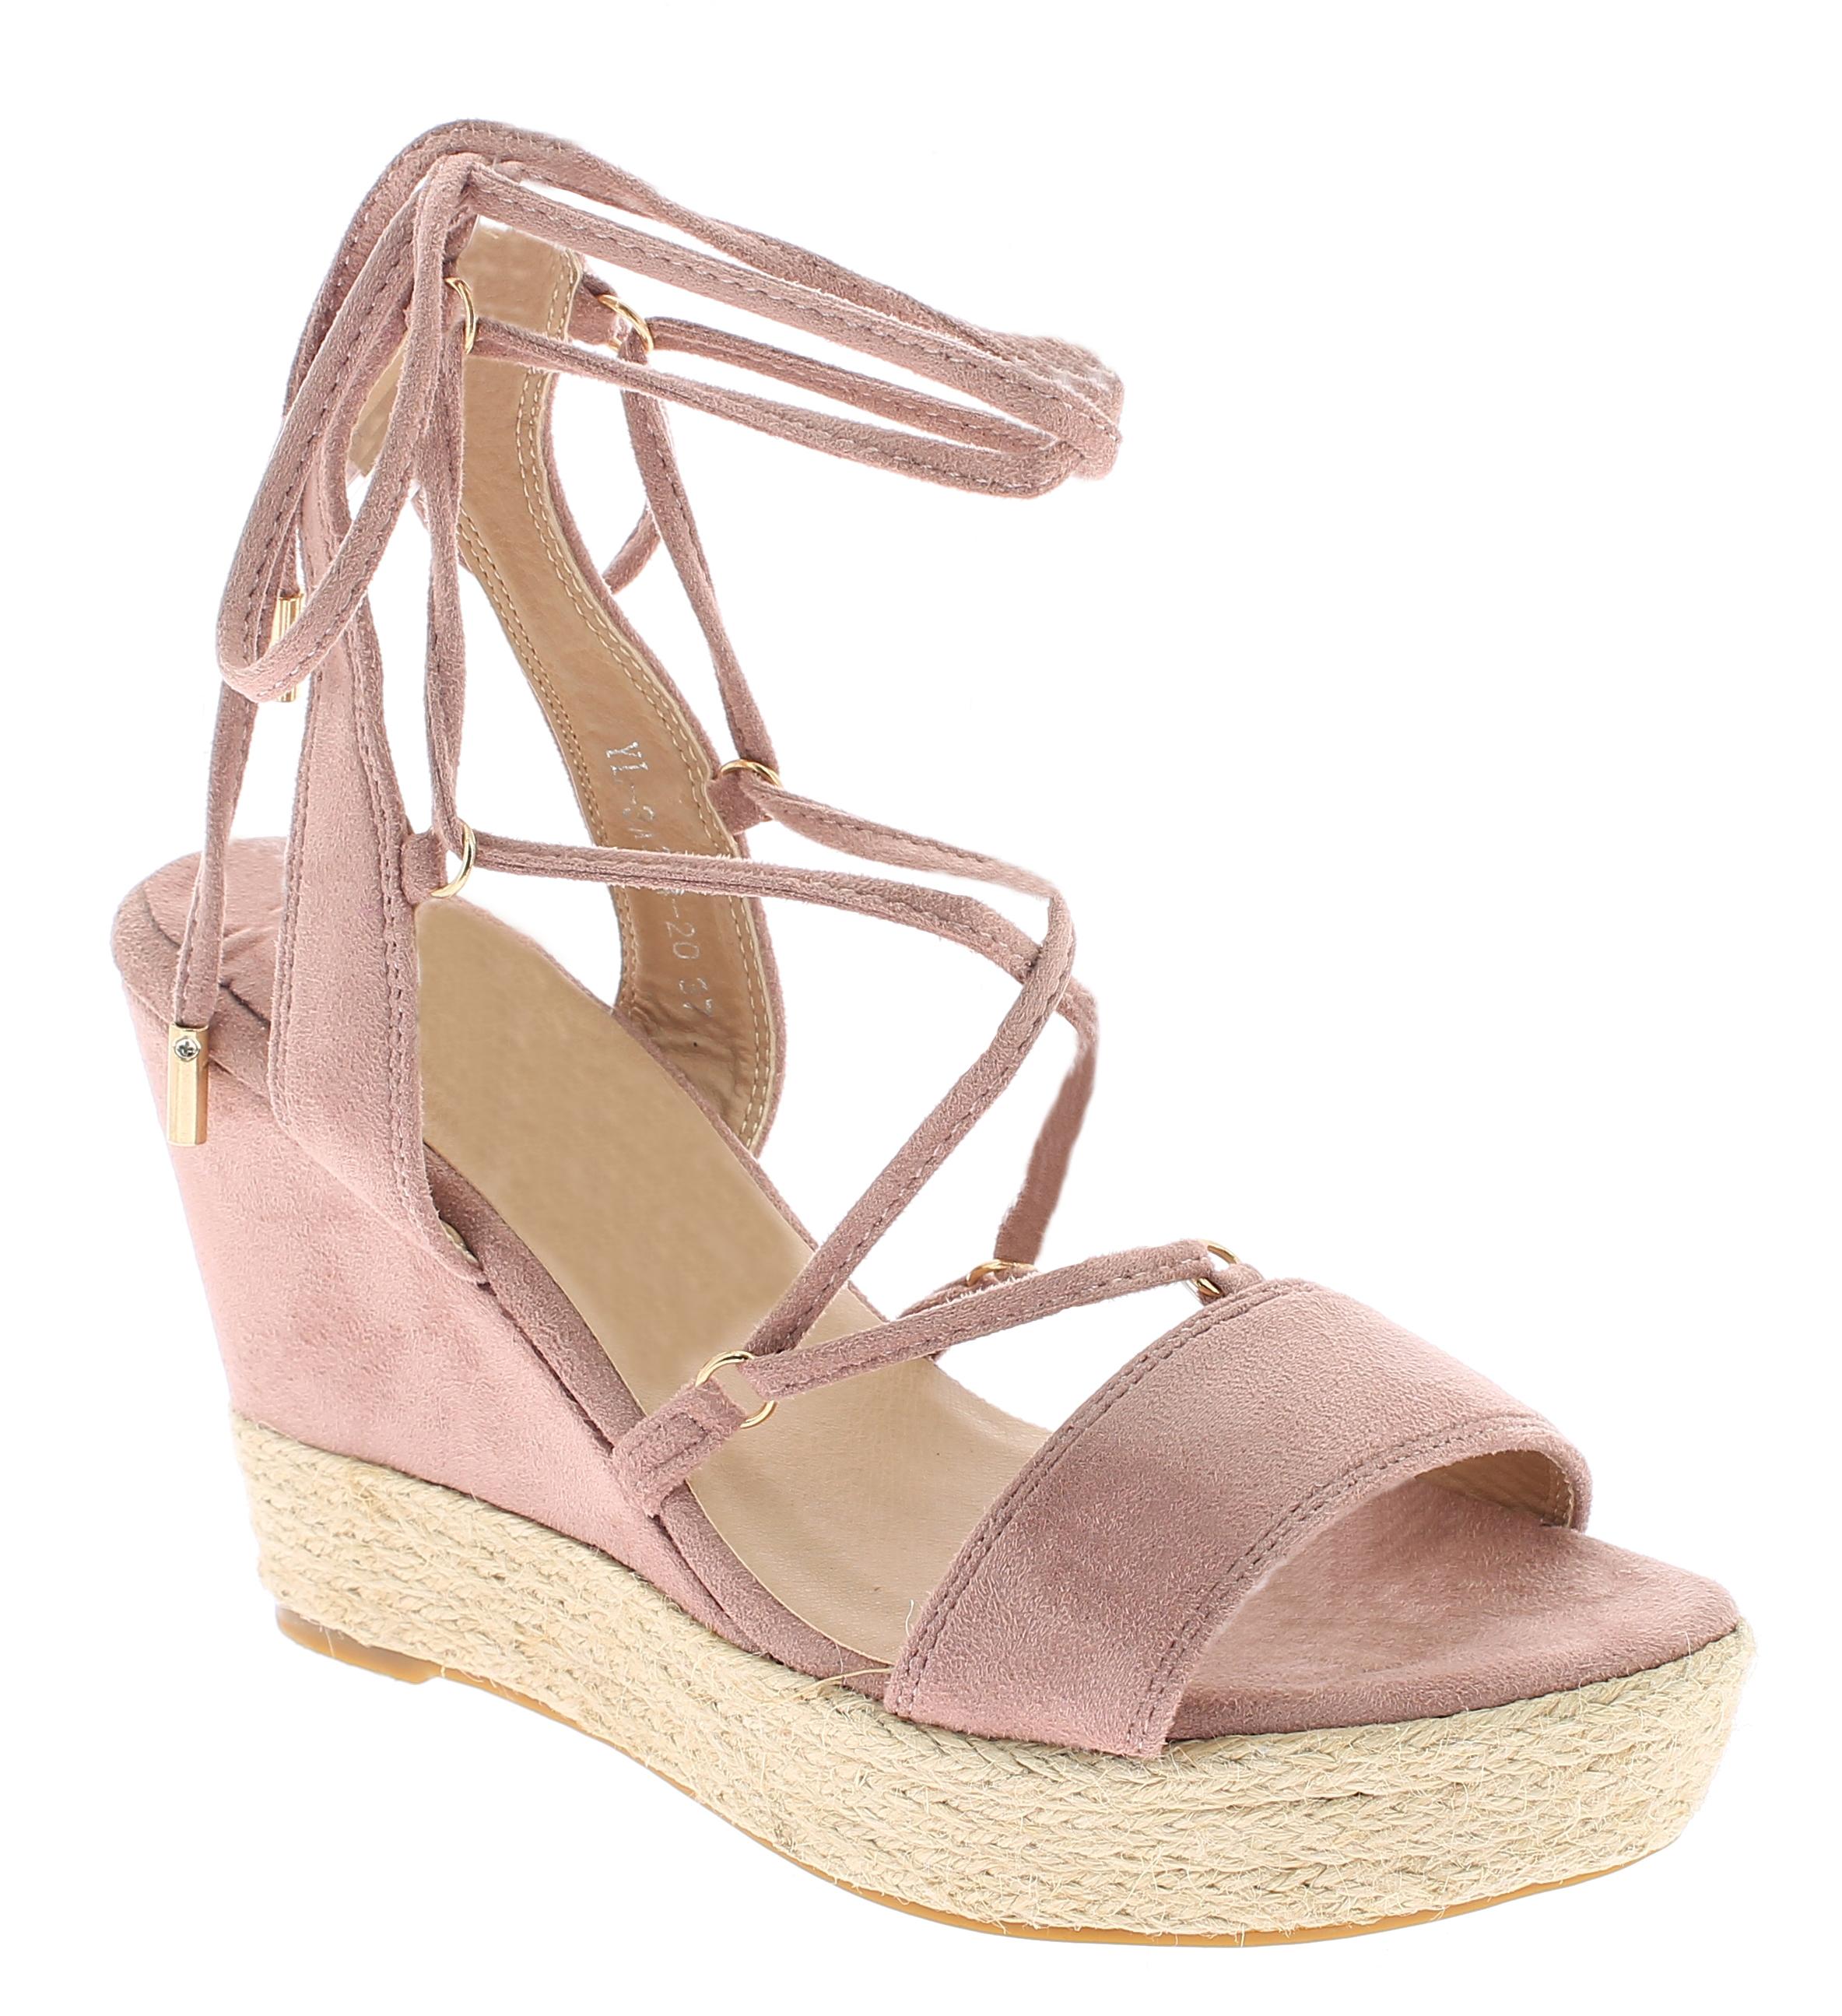 IQSHOES Γυναικεία Πλατφόρμα 3A364 Ρόζ - IqShoes - 3A364 PINK-pink-38/1/11/11 παπούτσια  πέδιλα